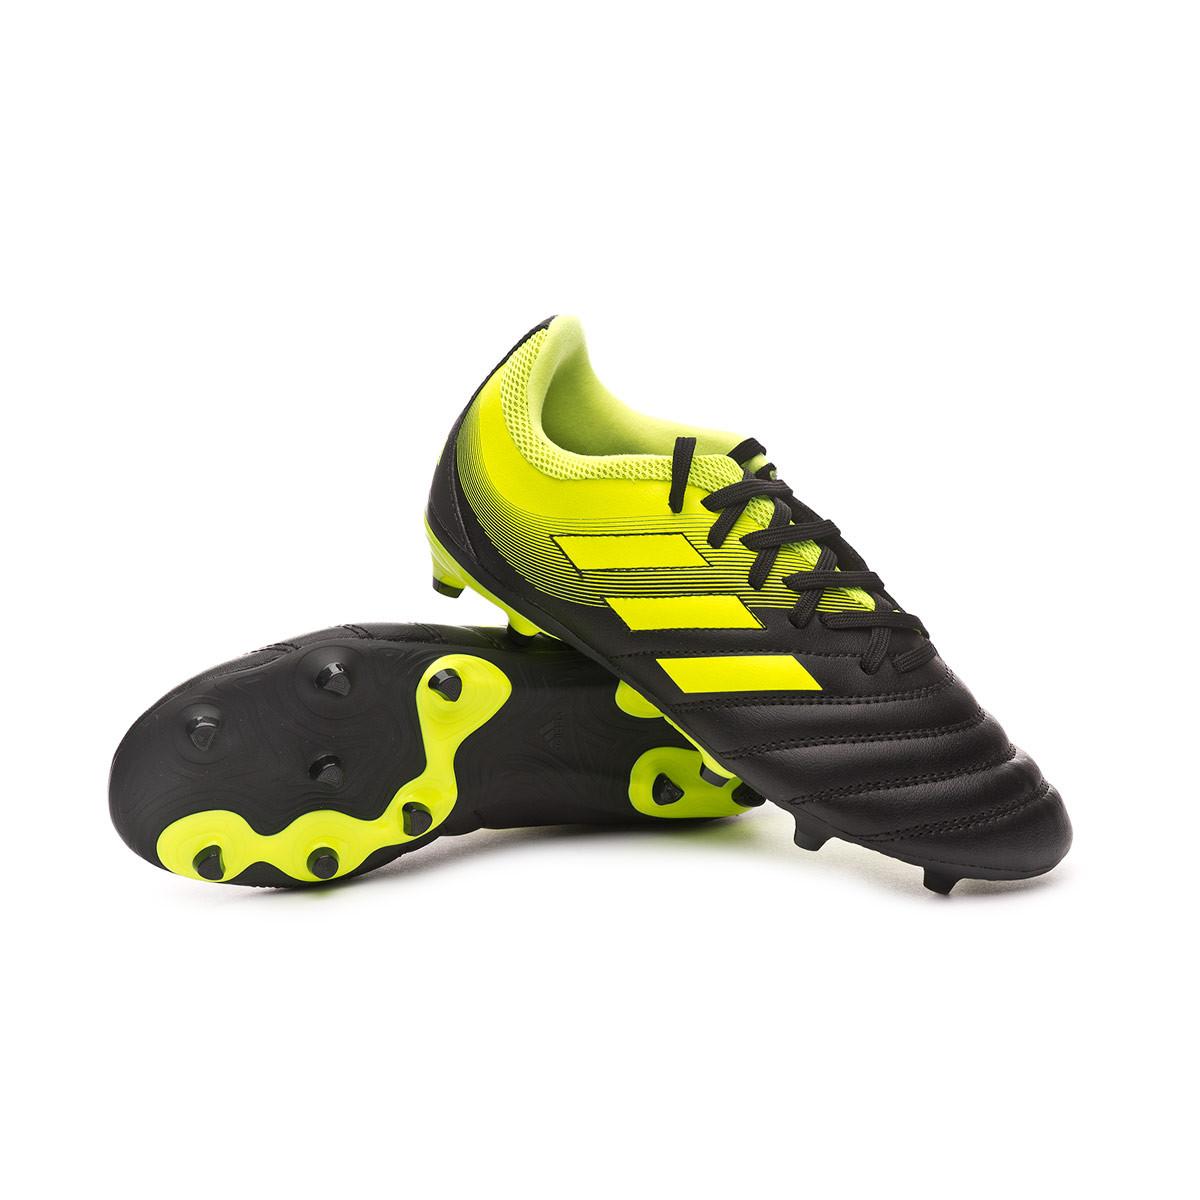 a8c6408d4 adidas Copa 19.3 FG Niño Football Boots. Core black-Solar yellow ...